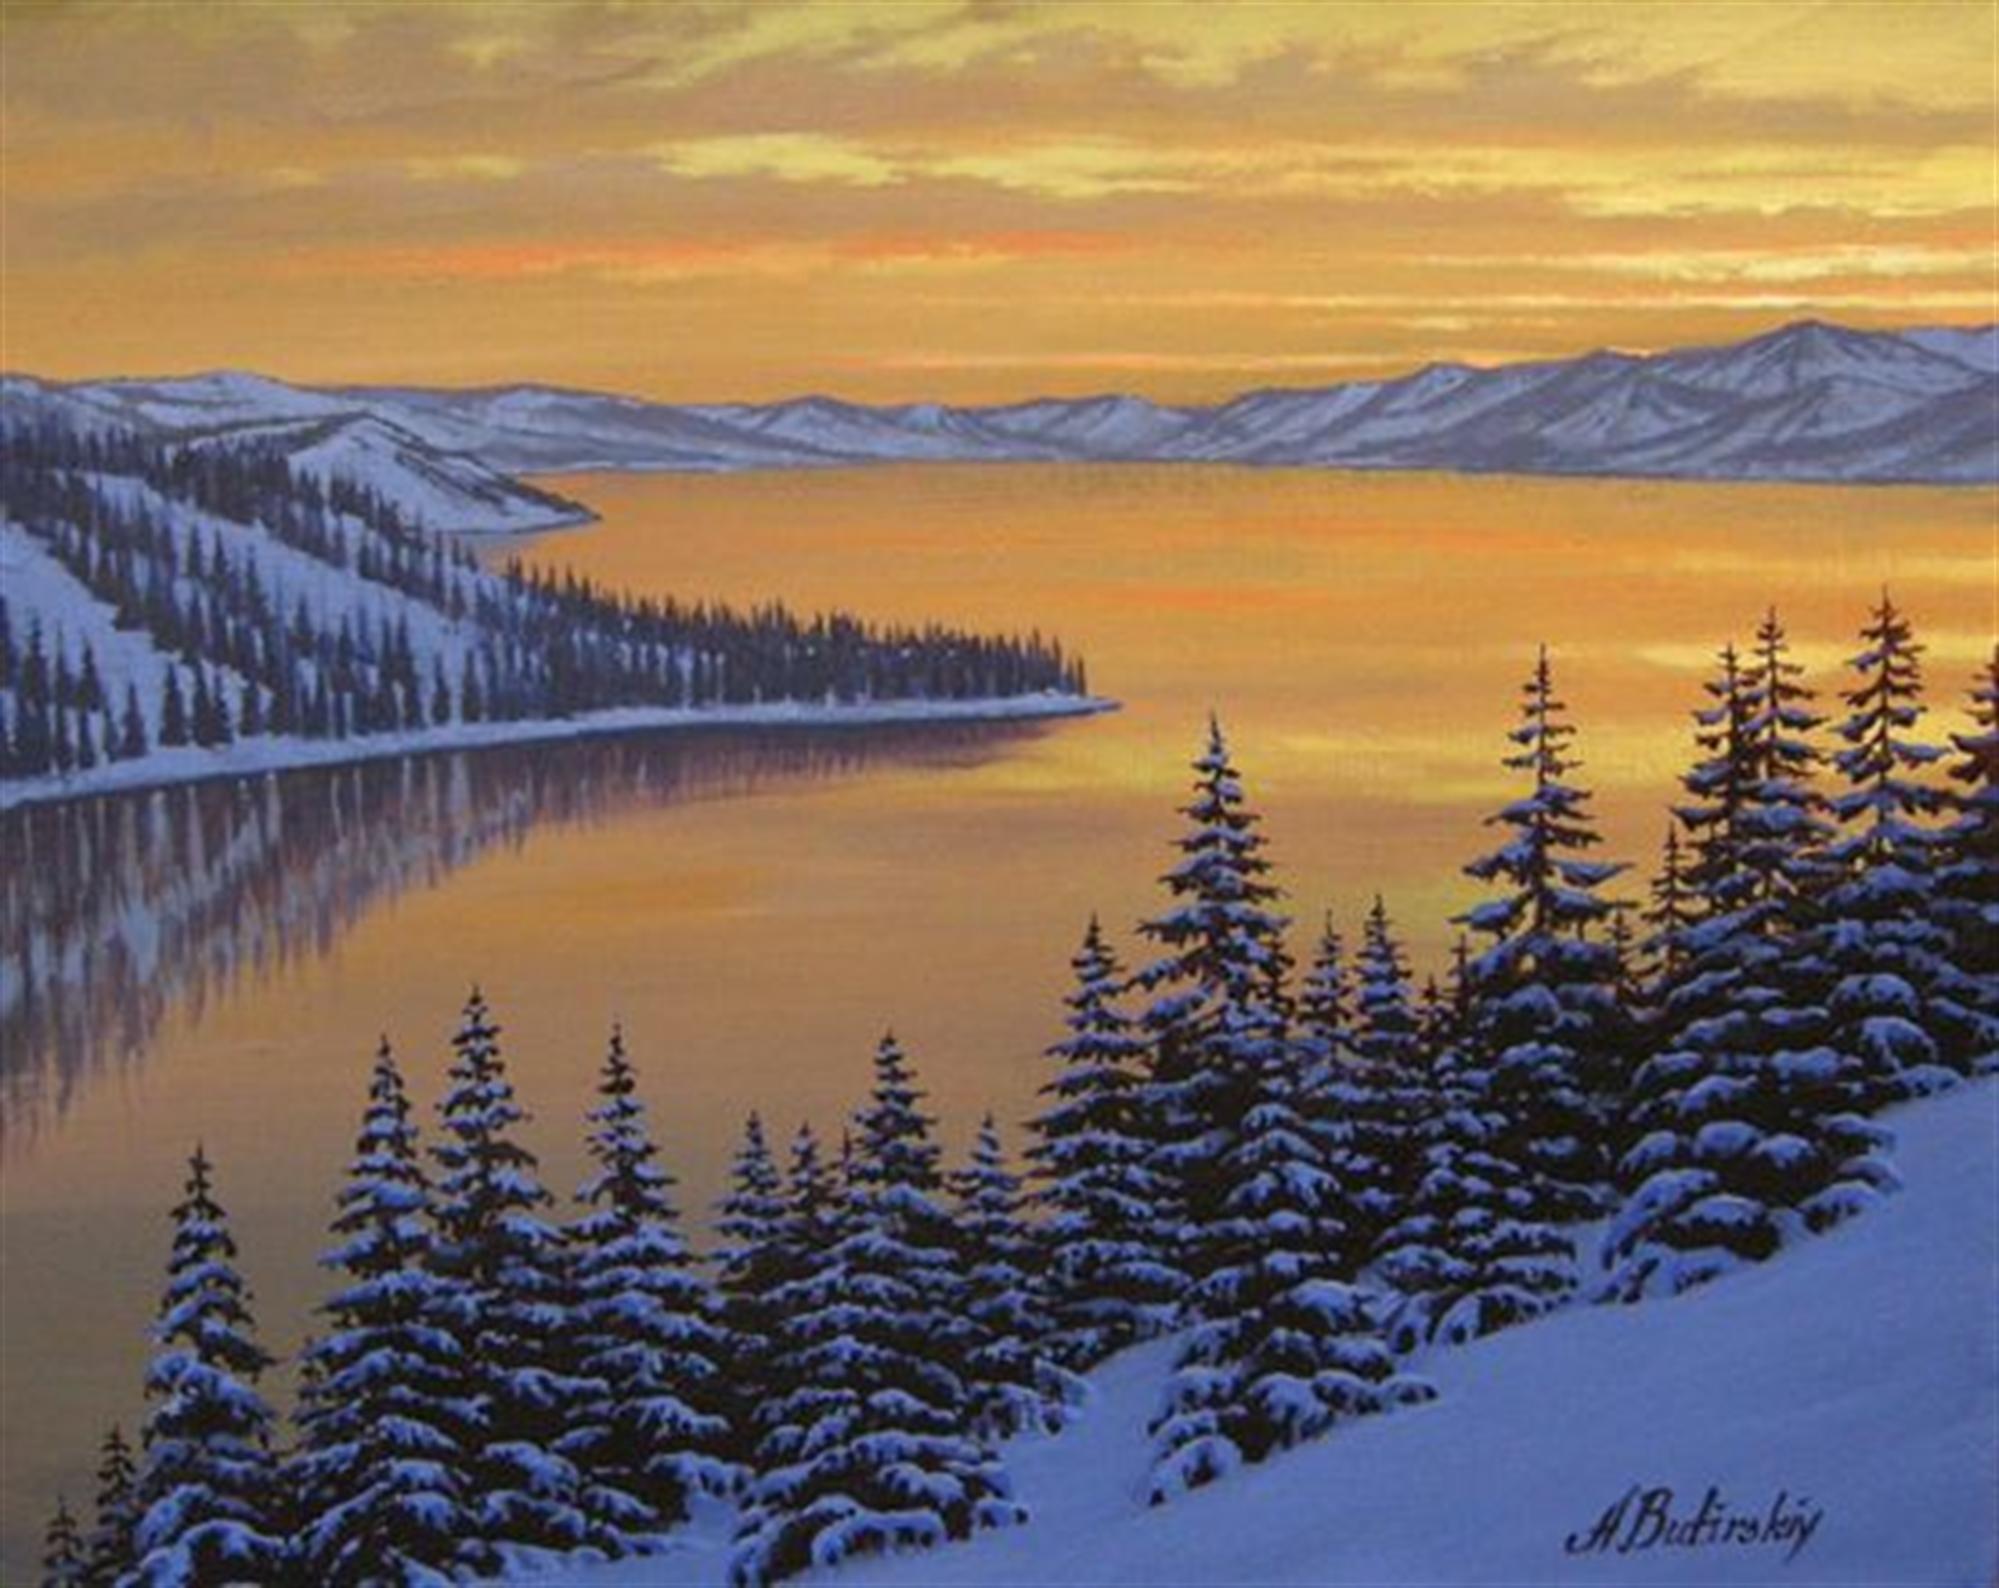 Winter Colors by Alexei Butirskiy